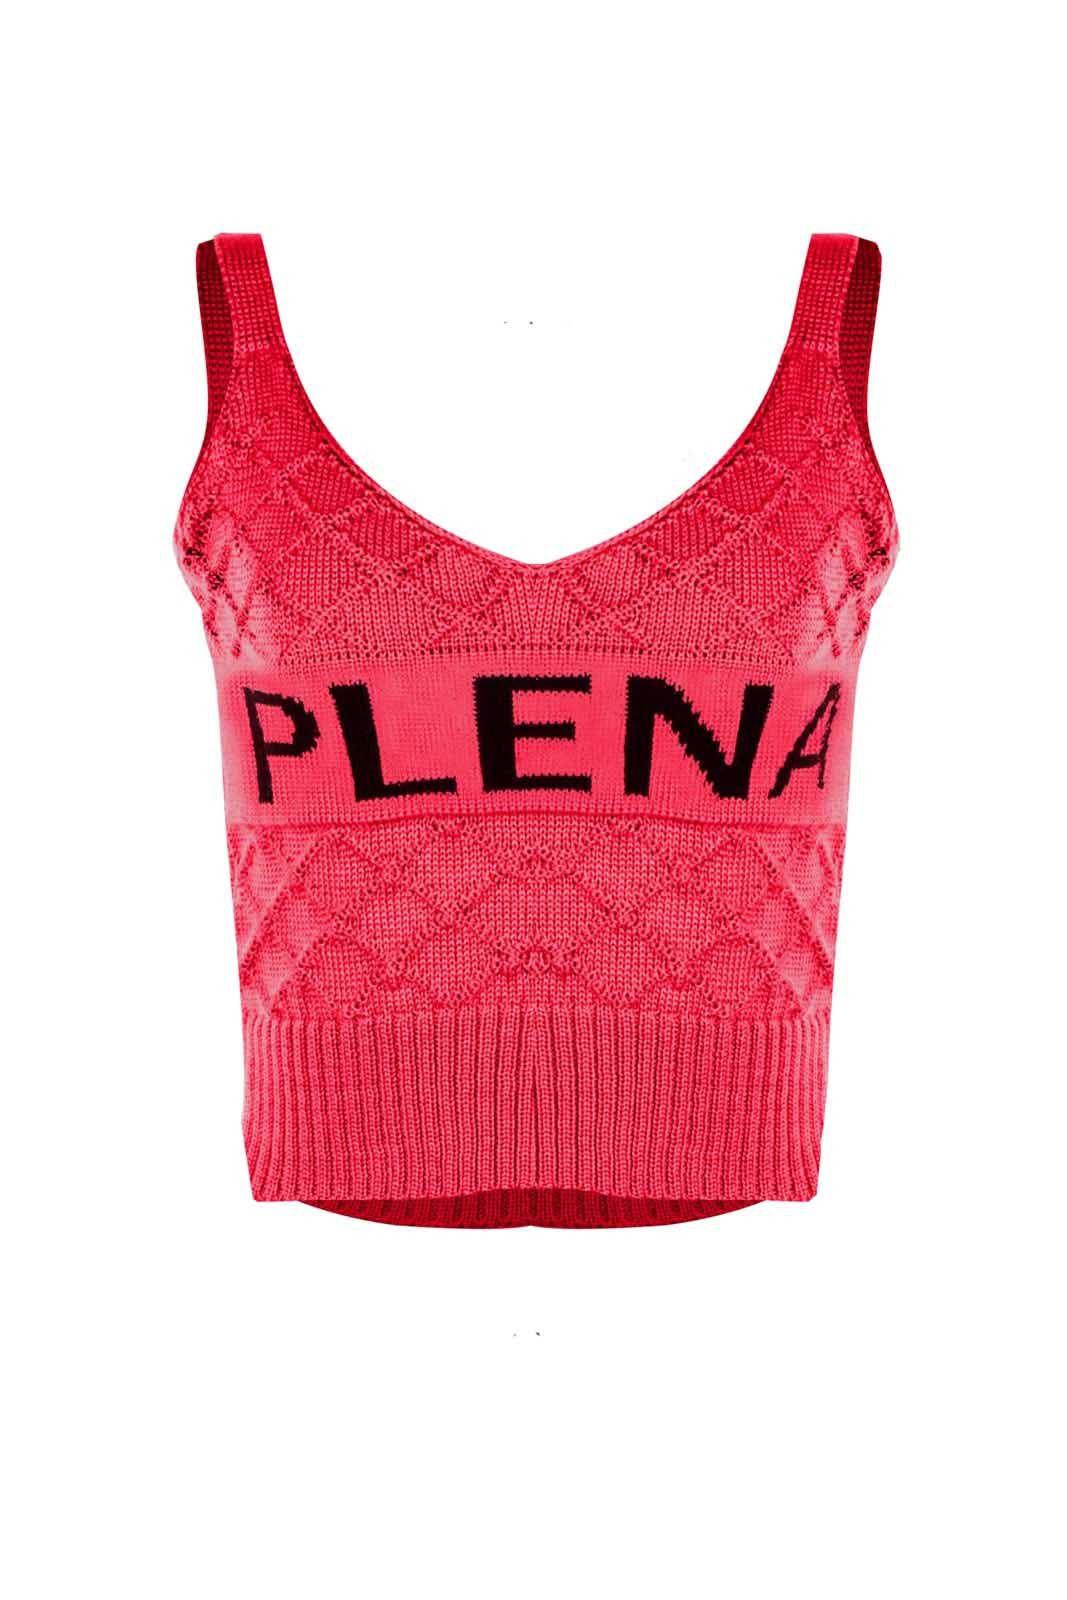 Top Outlet Dri Cropped Tricot Estampado Estampa Plena Pink